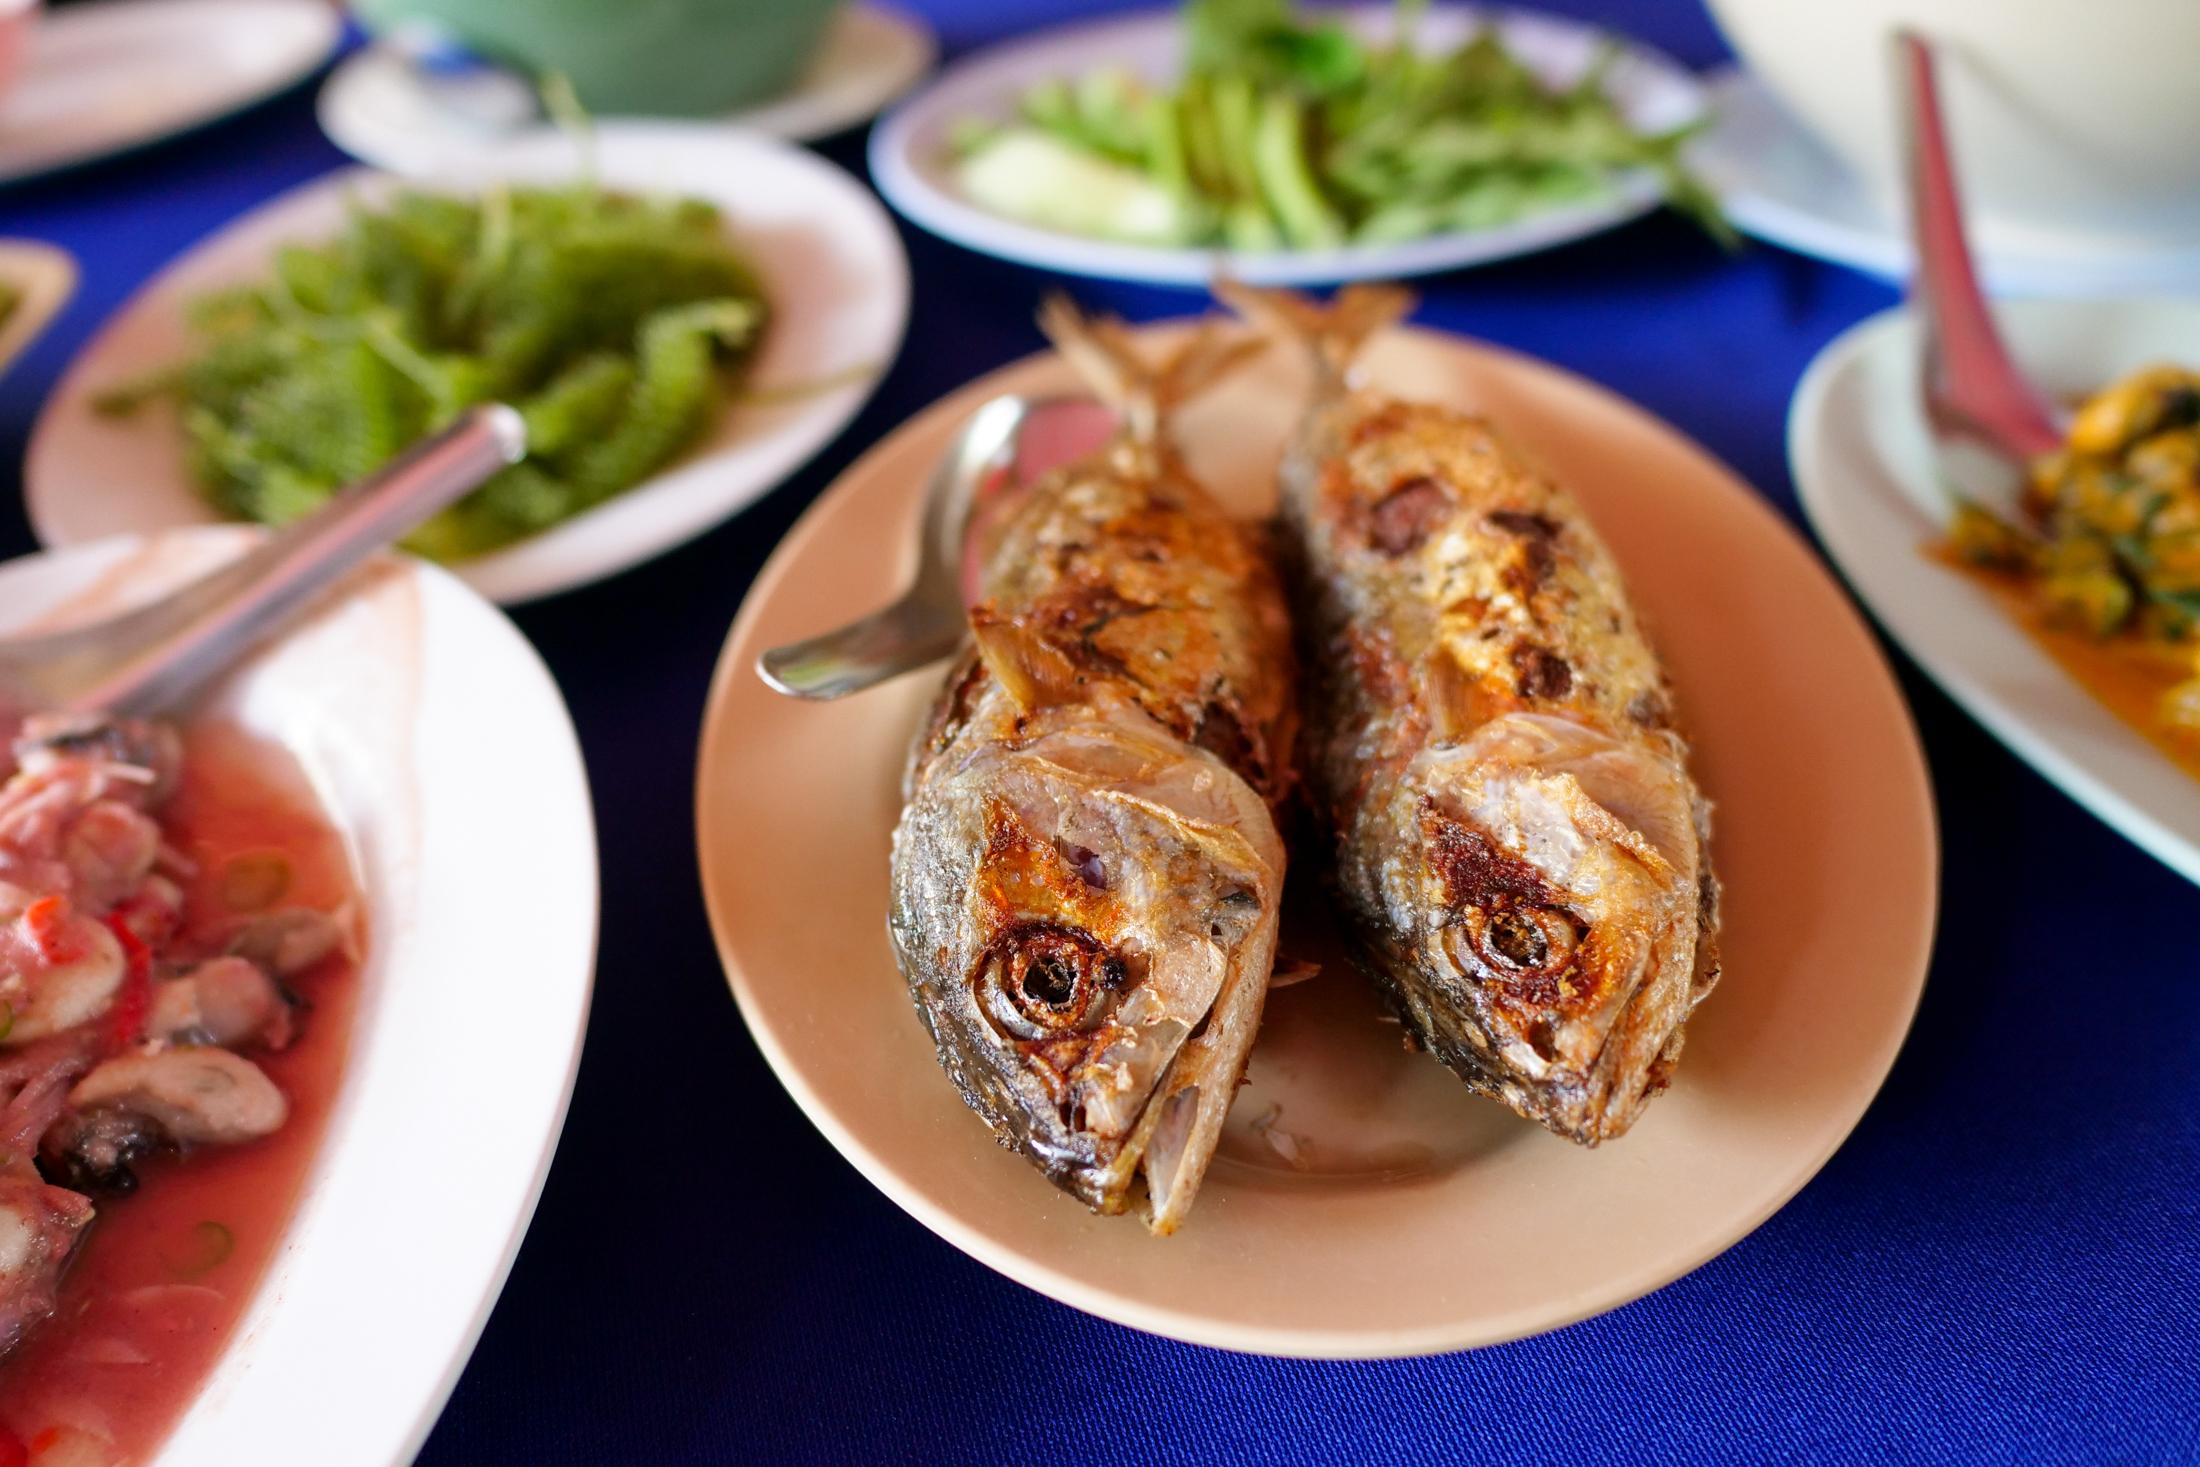 Mor Mu Dong Restaurant (หมอมูดง ภูเก็ต)